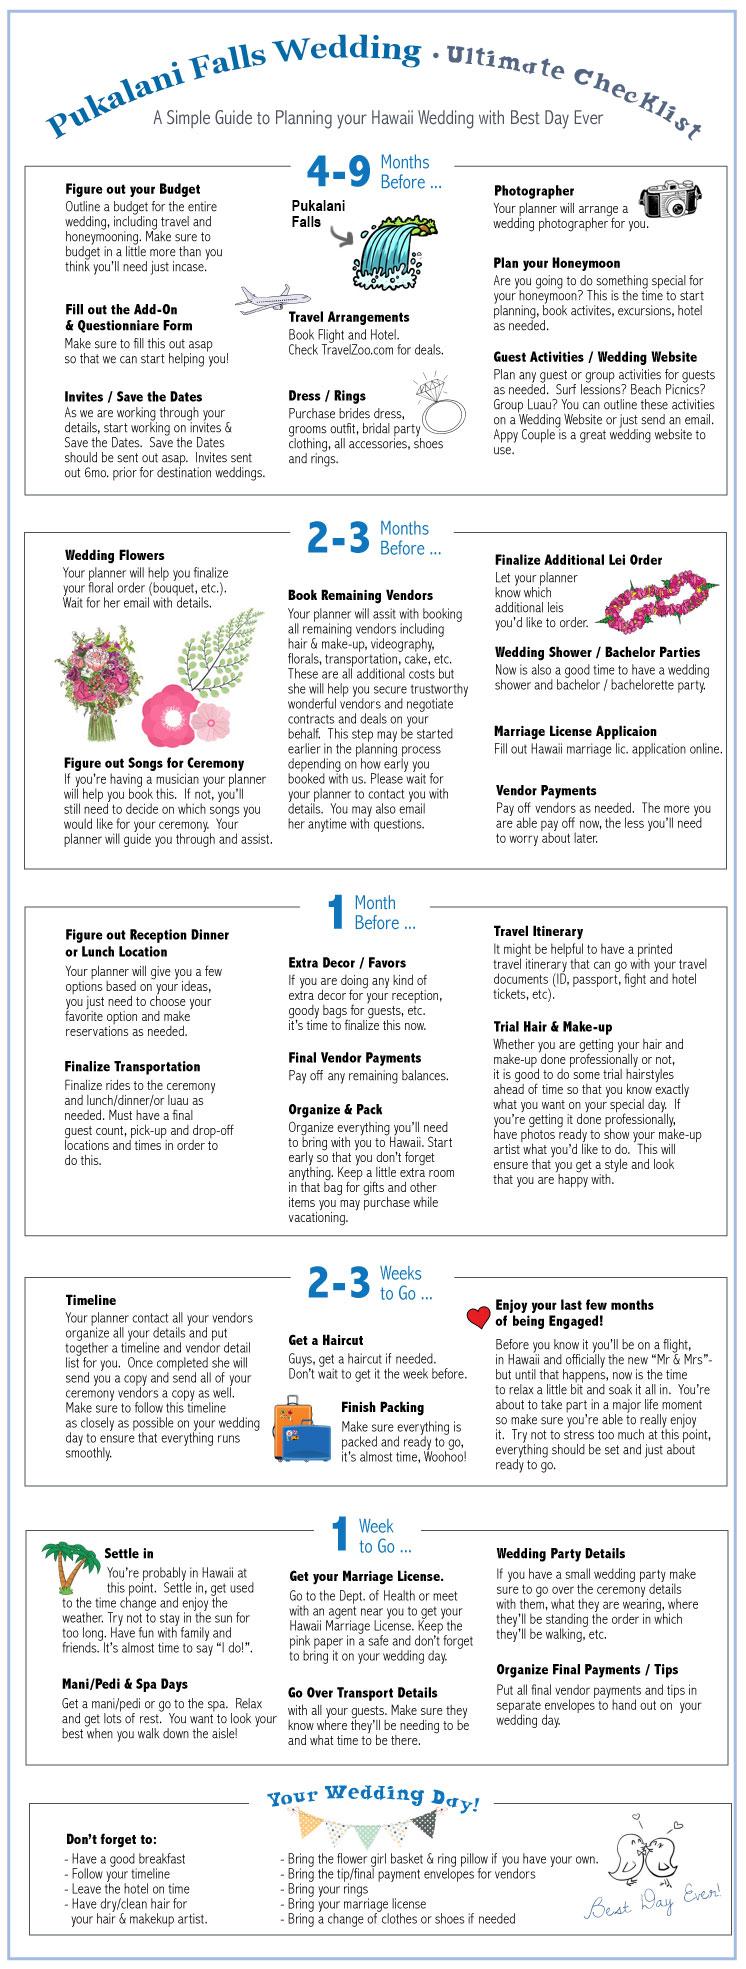 pukalani-wedding-checklist